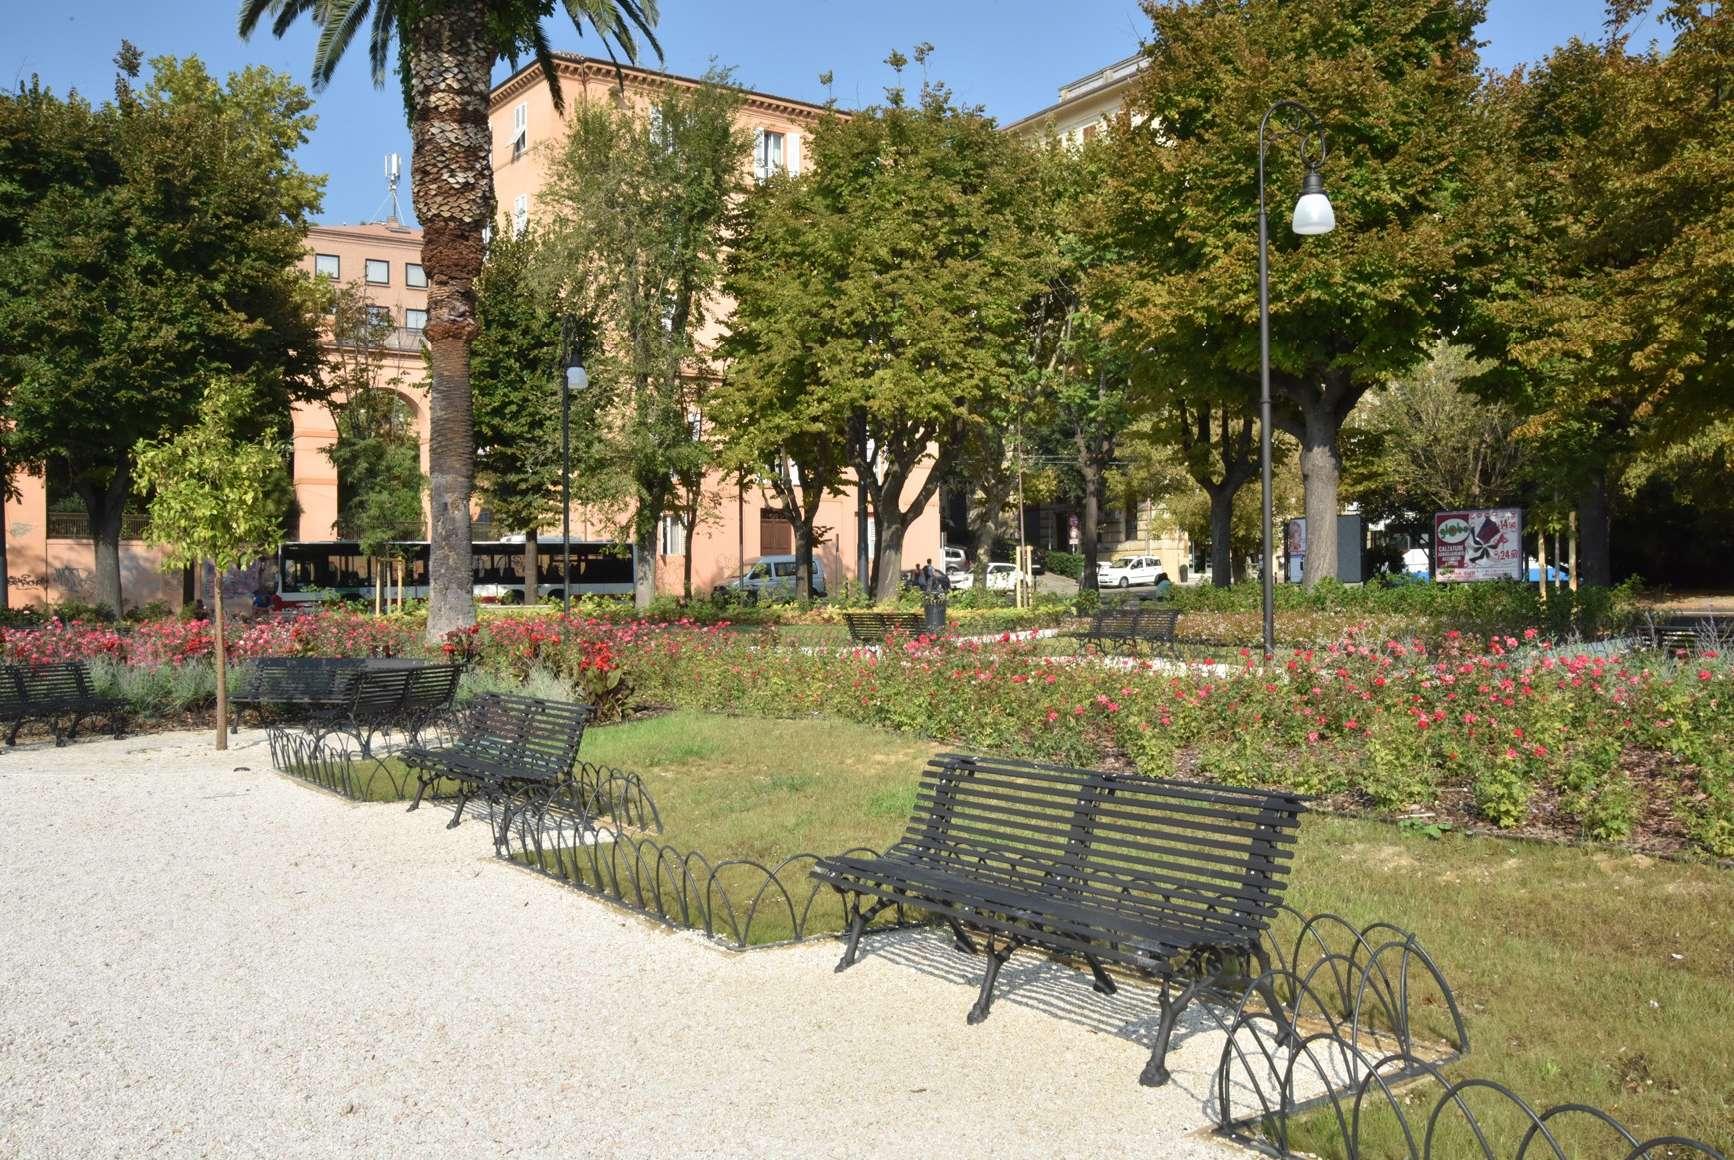 Le panchine di piazza Cavour ad Ancona restaurate da Neri Spa